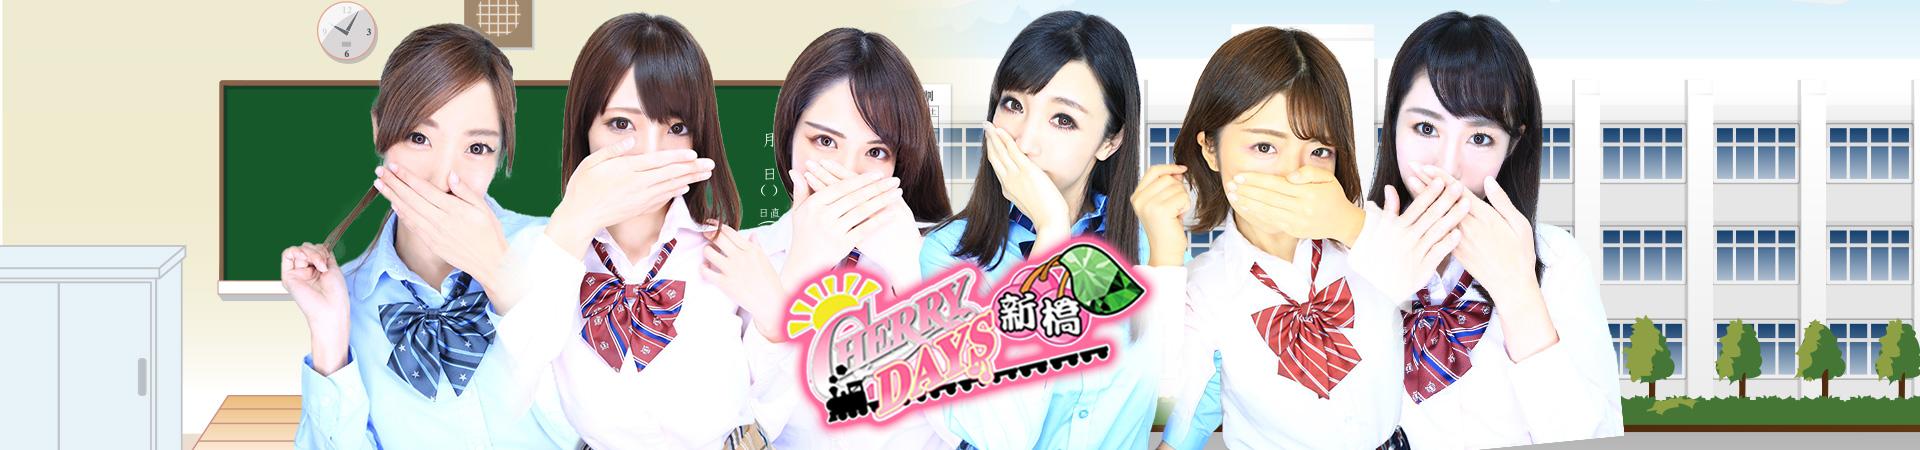 CHERRY DAYS 新橋(チェリーデイズ シンバシ)